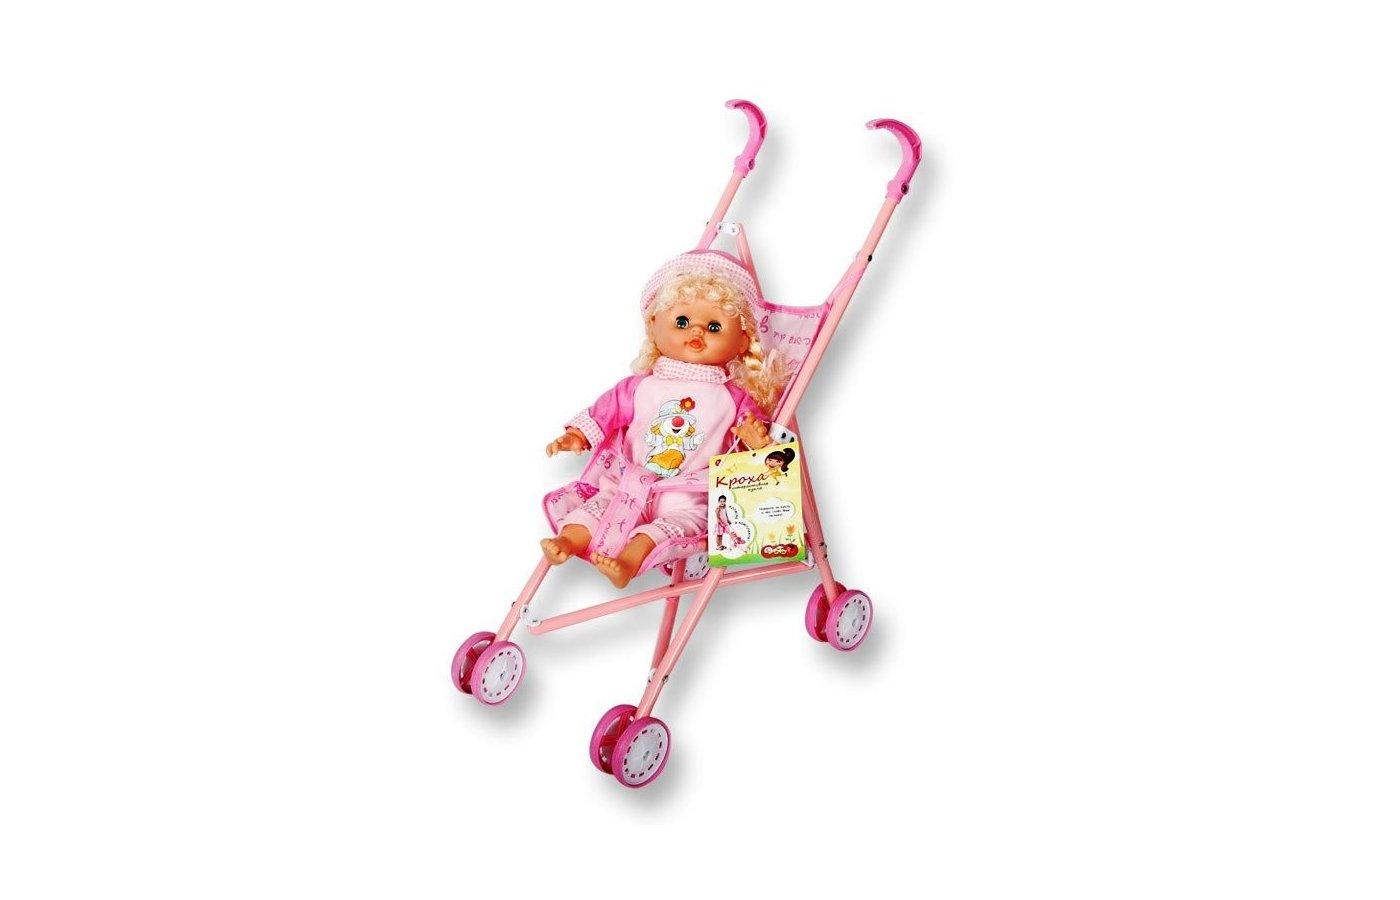 Игрушка DollyToy DOL0804-007 Интерактивная кукла Кроха